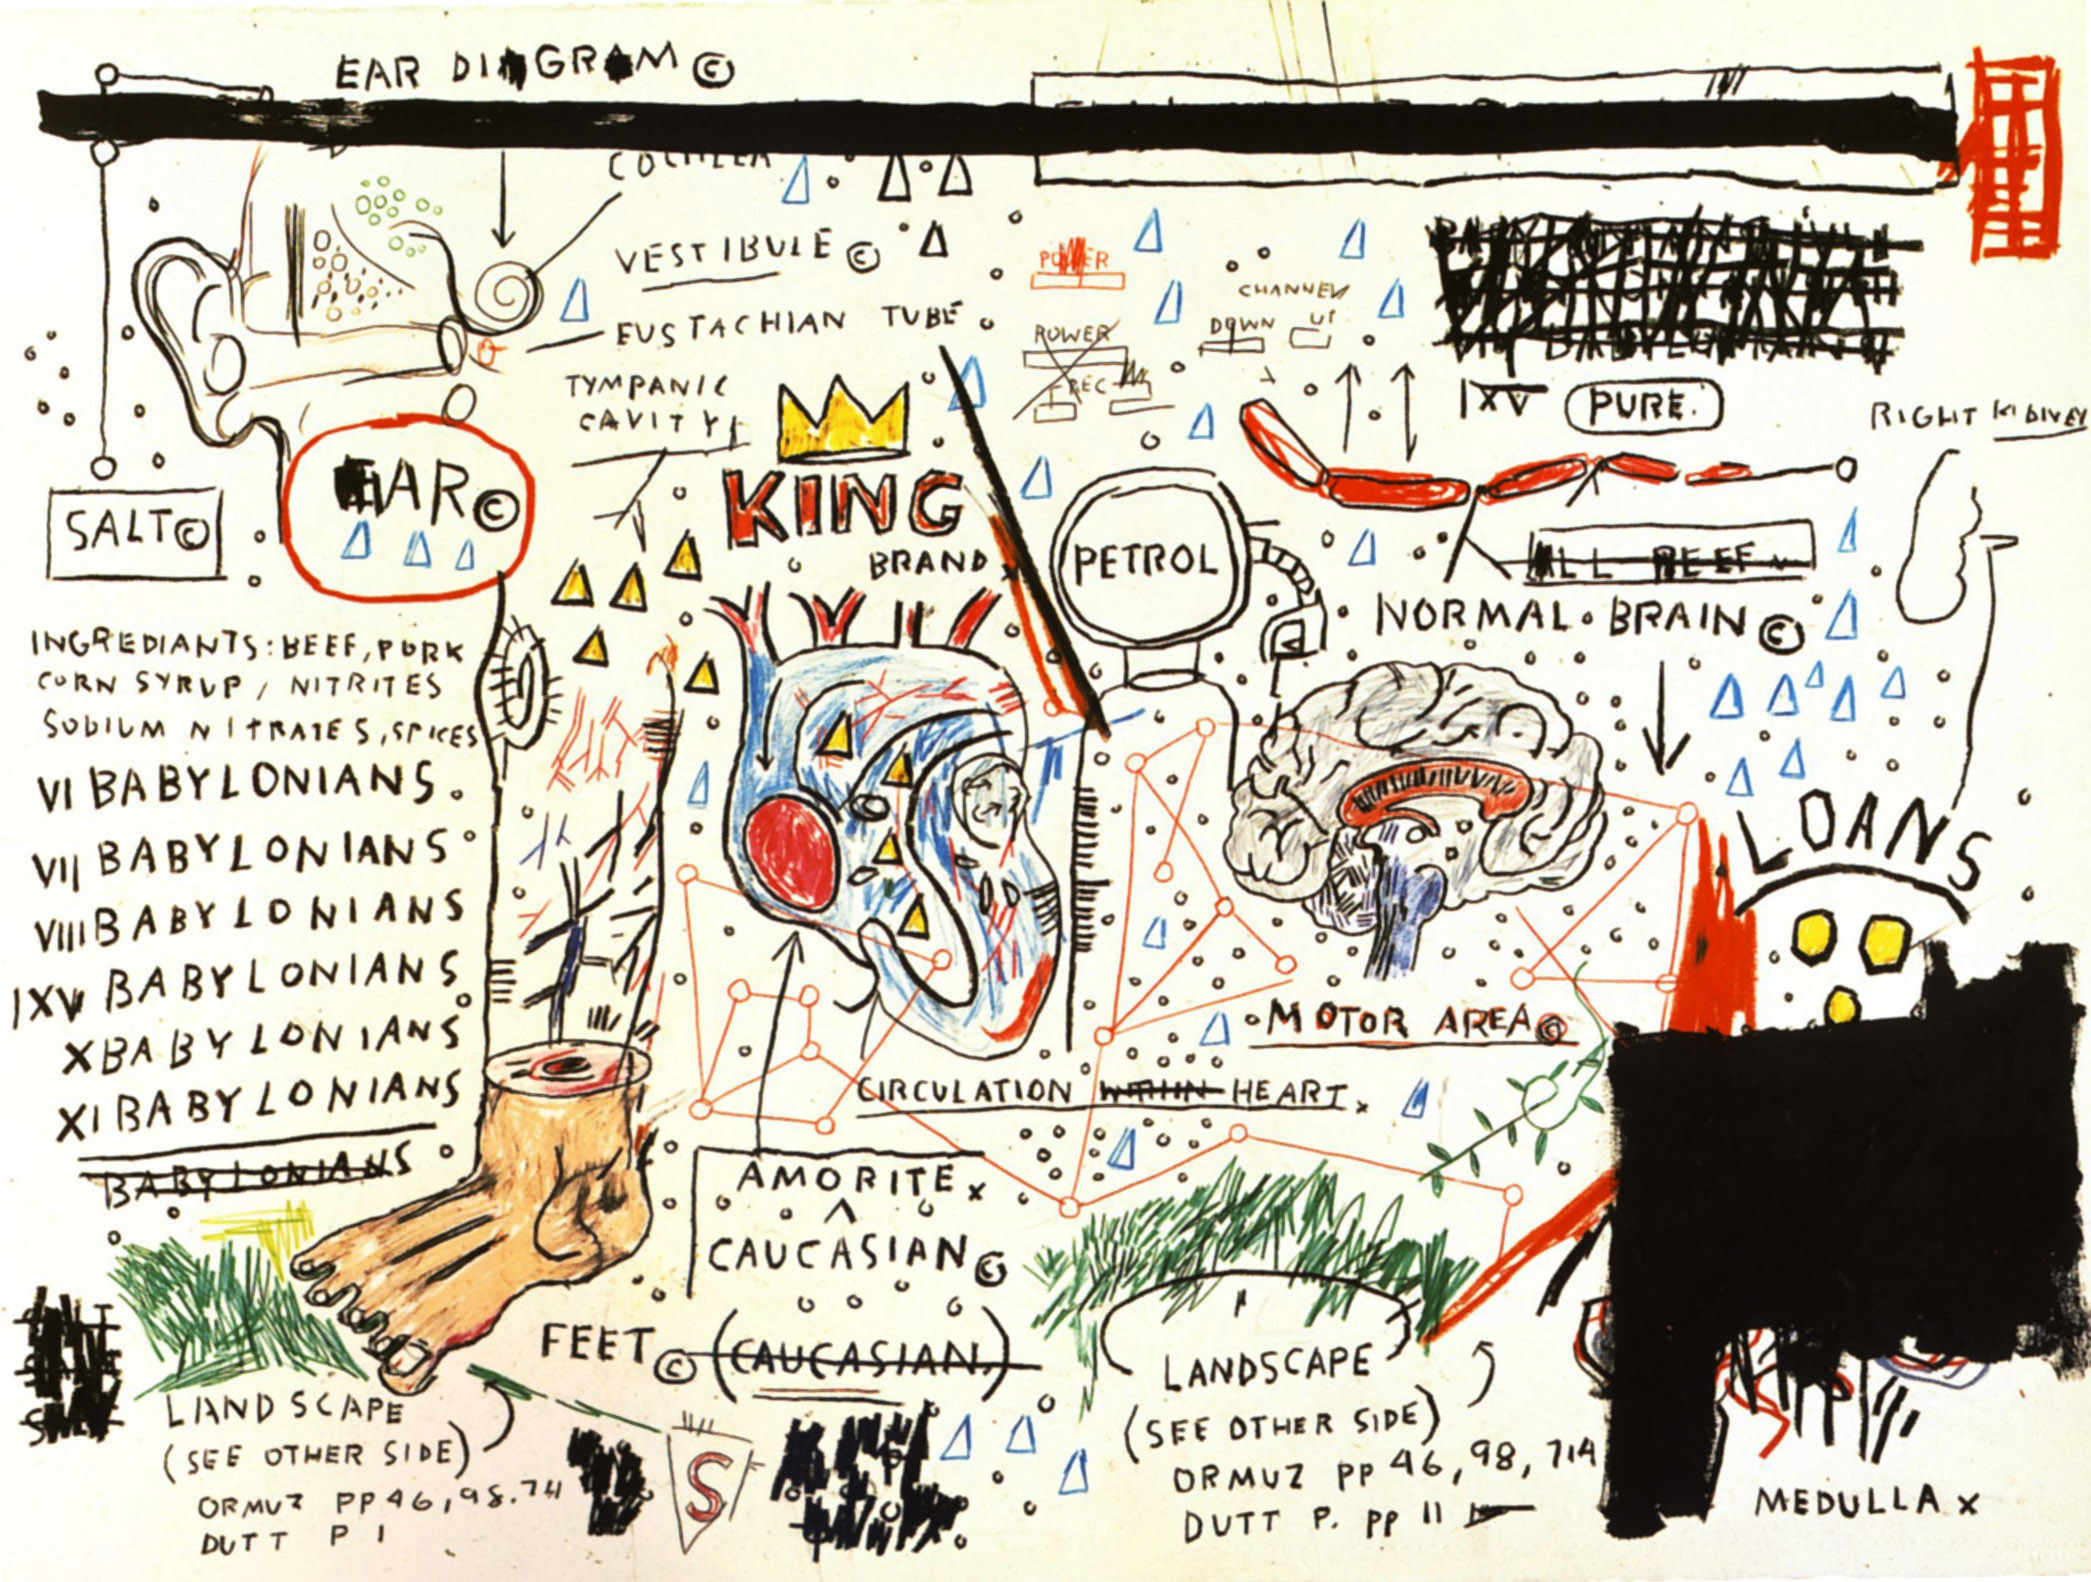 King Brand, marca del rey, de Jean Michel Basquiat